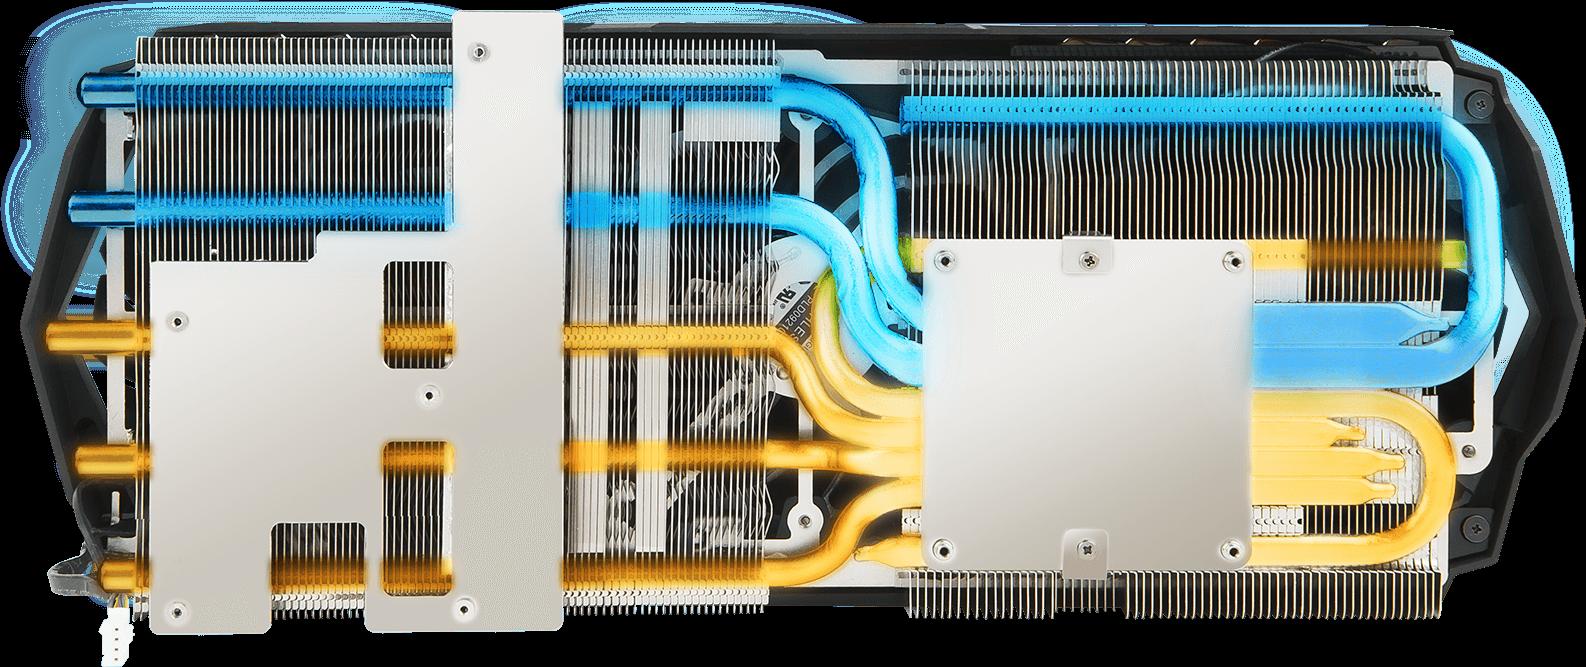 https://asset.msi.com/global/picture/image/feature/vga/NVIDIA/GTX1080Ti/Trio/Heatsink-1080Ti-TRIO.png